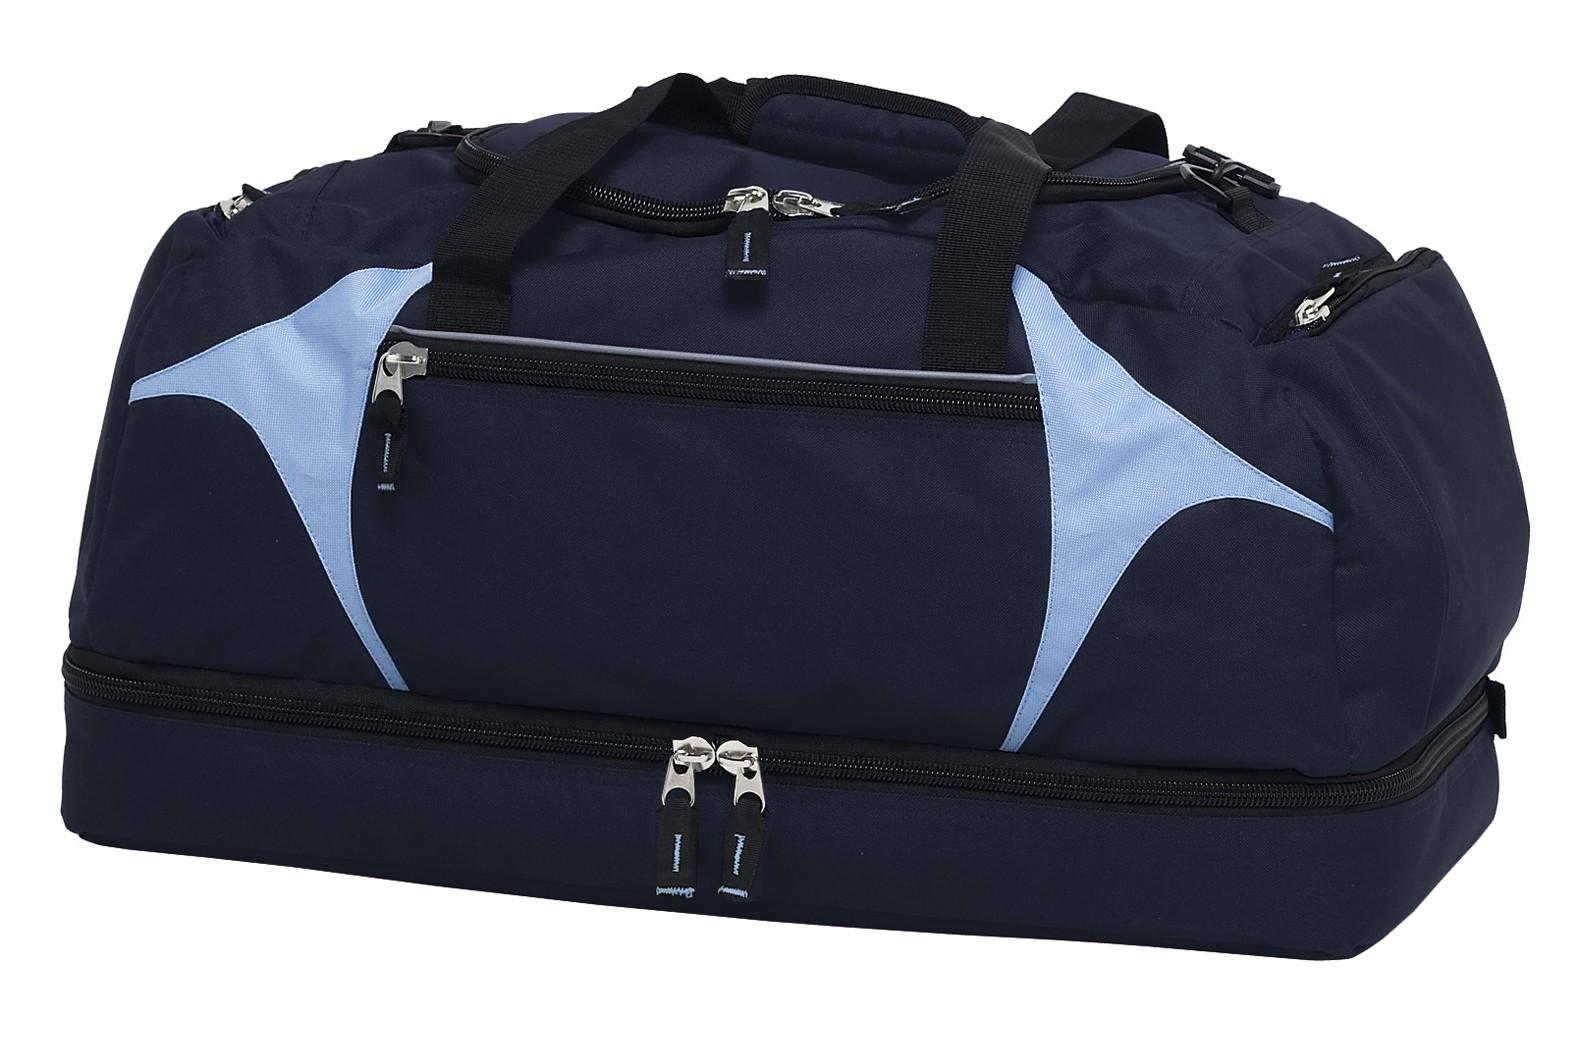 Spliced Zenith Sports Bag - Navy & Sky